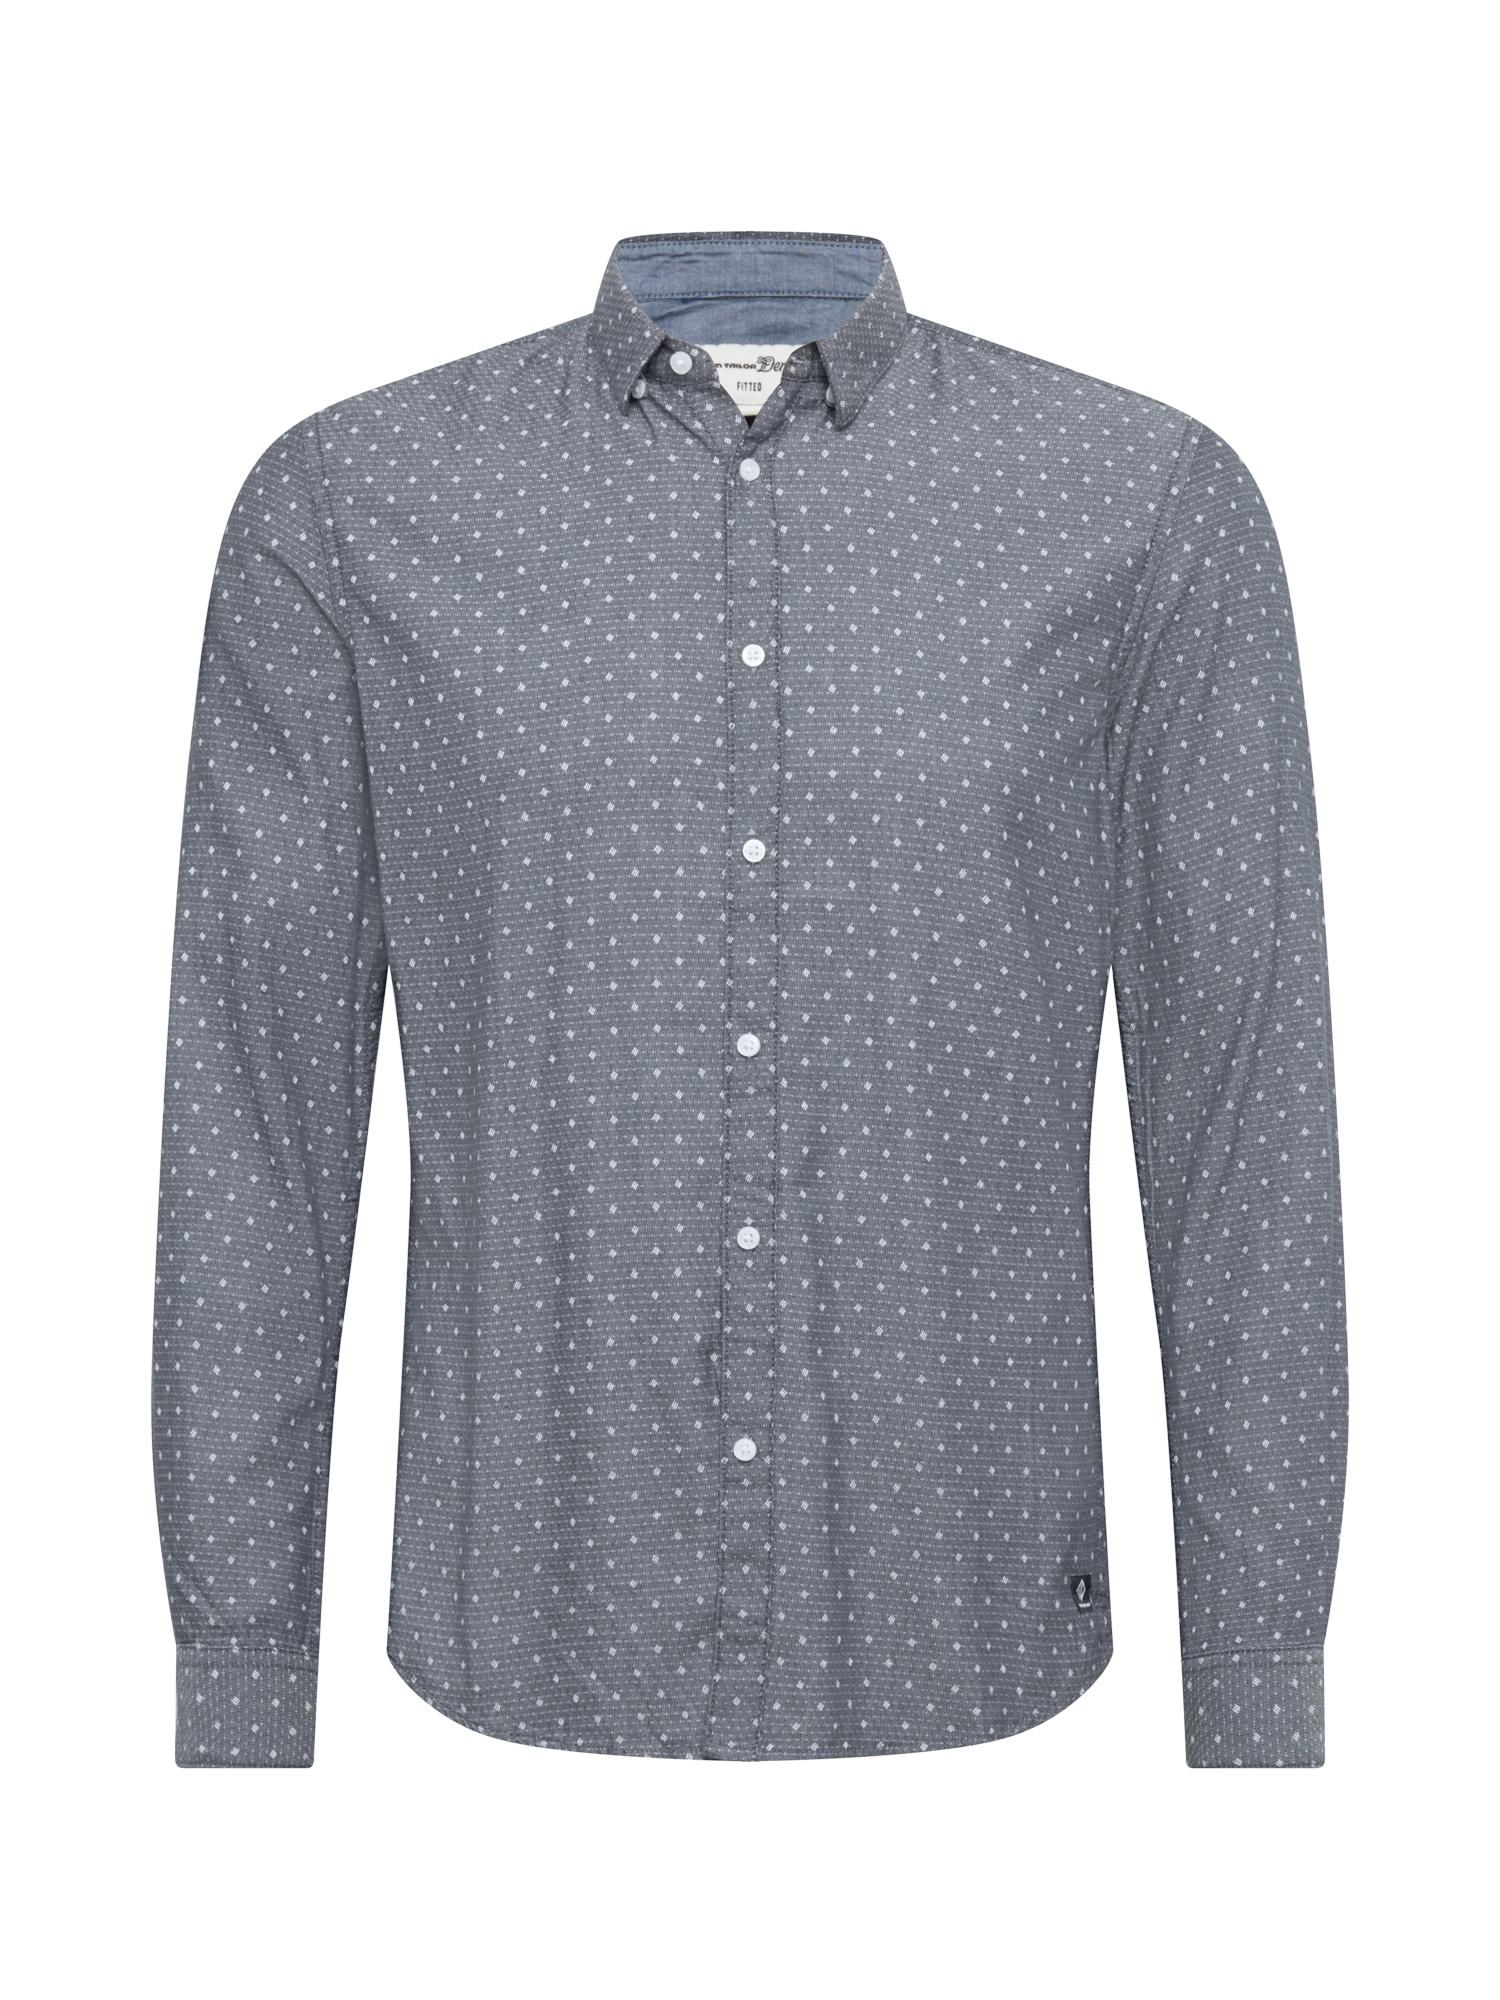 TOM TAILOR DENIM Košile  námořnická modř / bílá